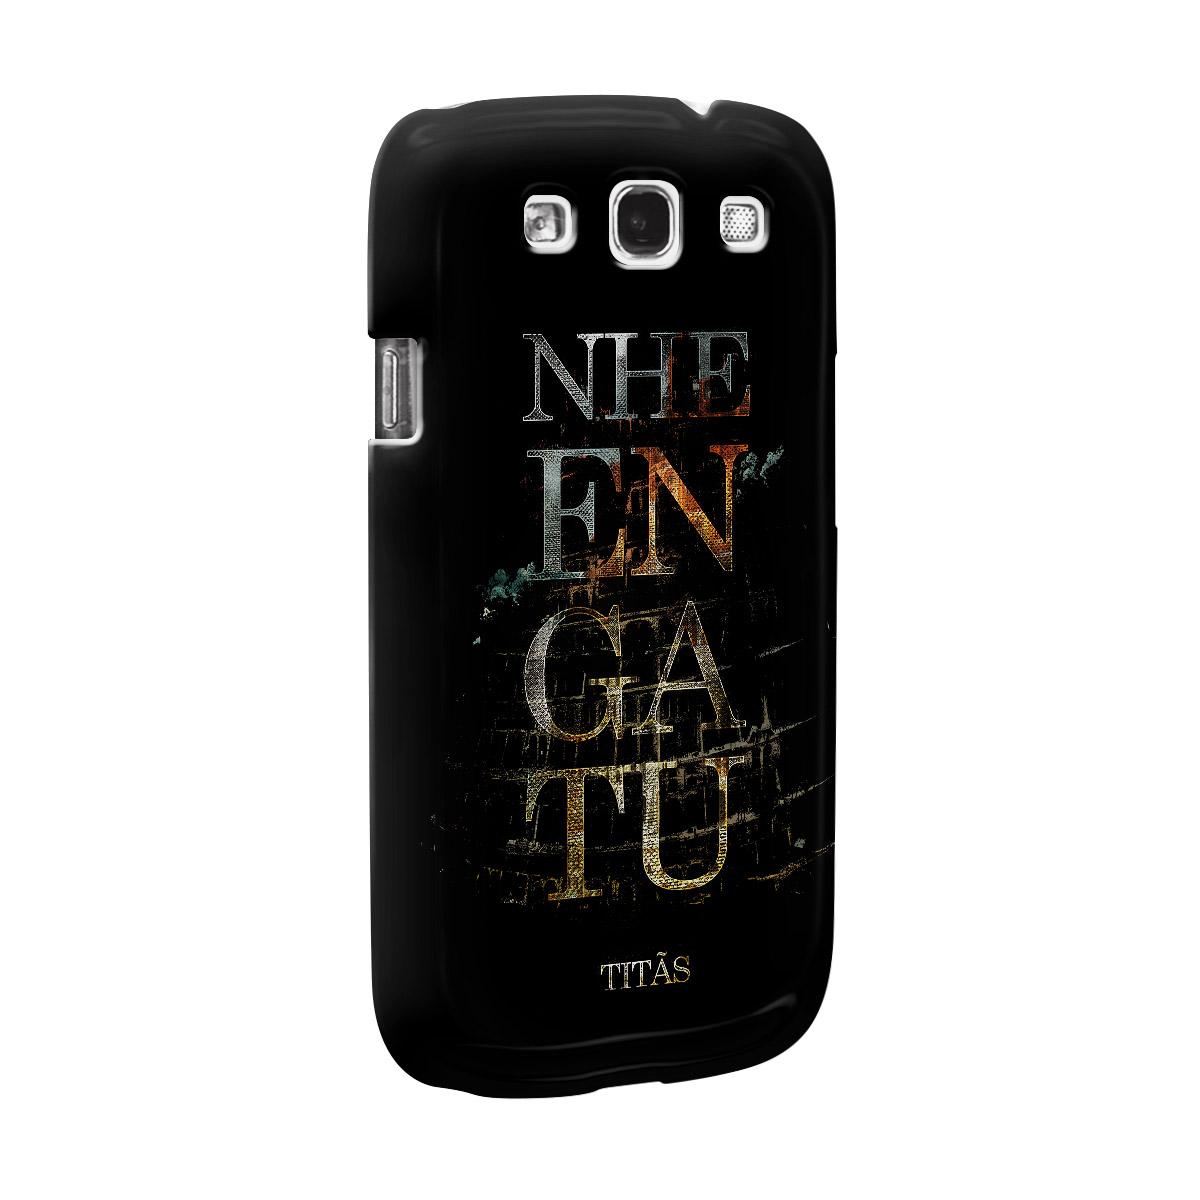 Capa de Celular Samsung Galaxy S3 Titãs Nheengatu